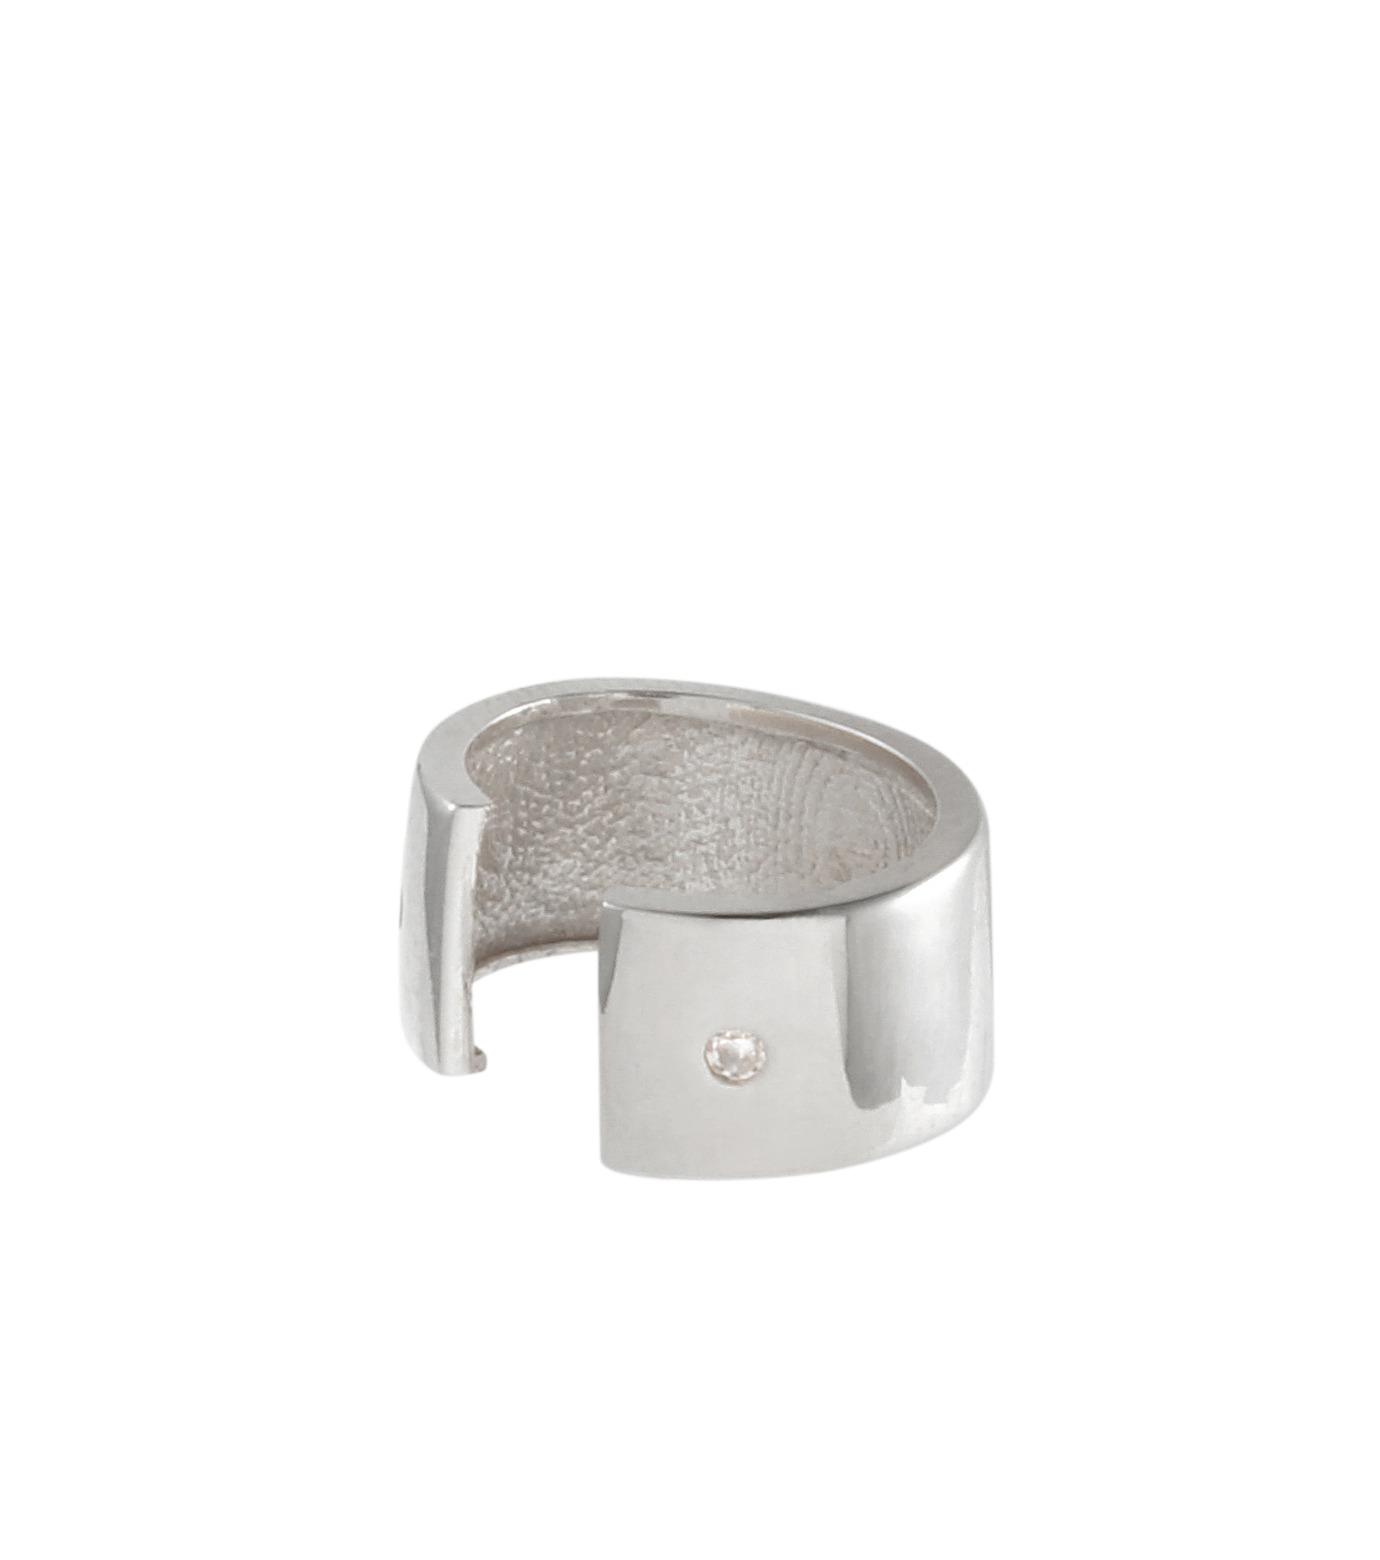 Campbell(キャンベル)のEar cuff-SILVER(アクセサリー/accessory)-T-CLASSIC-CU-1 拡大詳細画像1